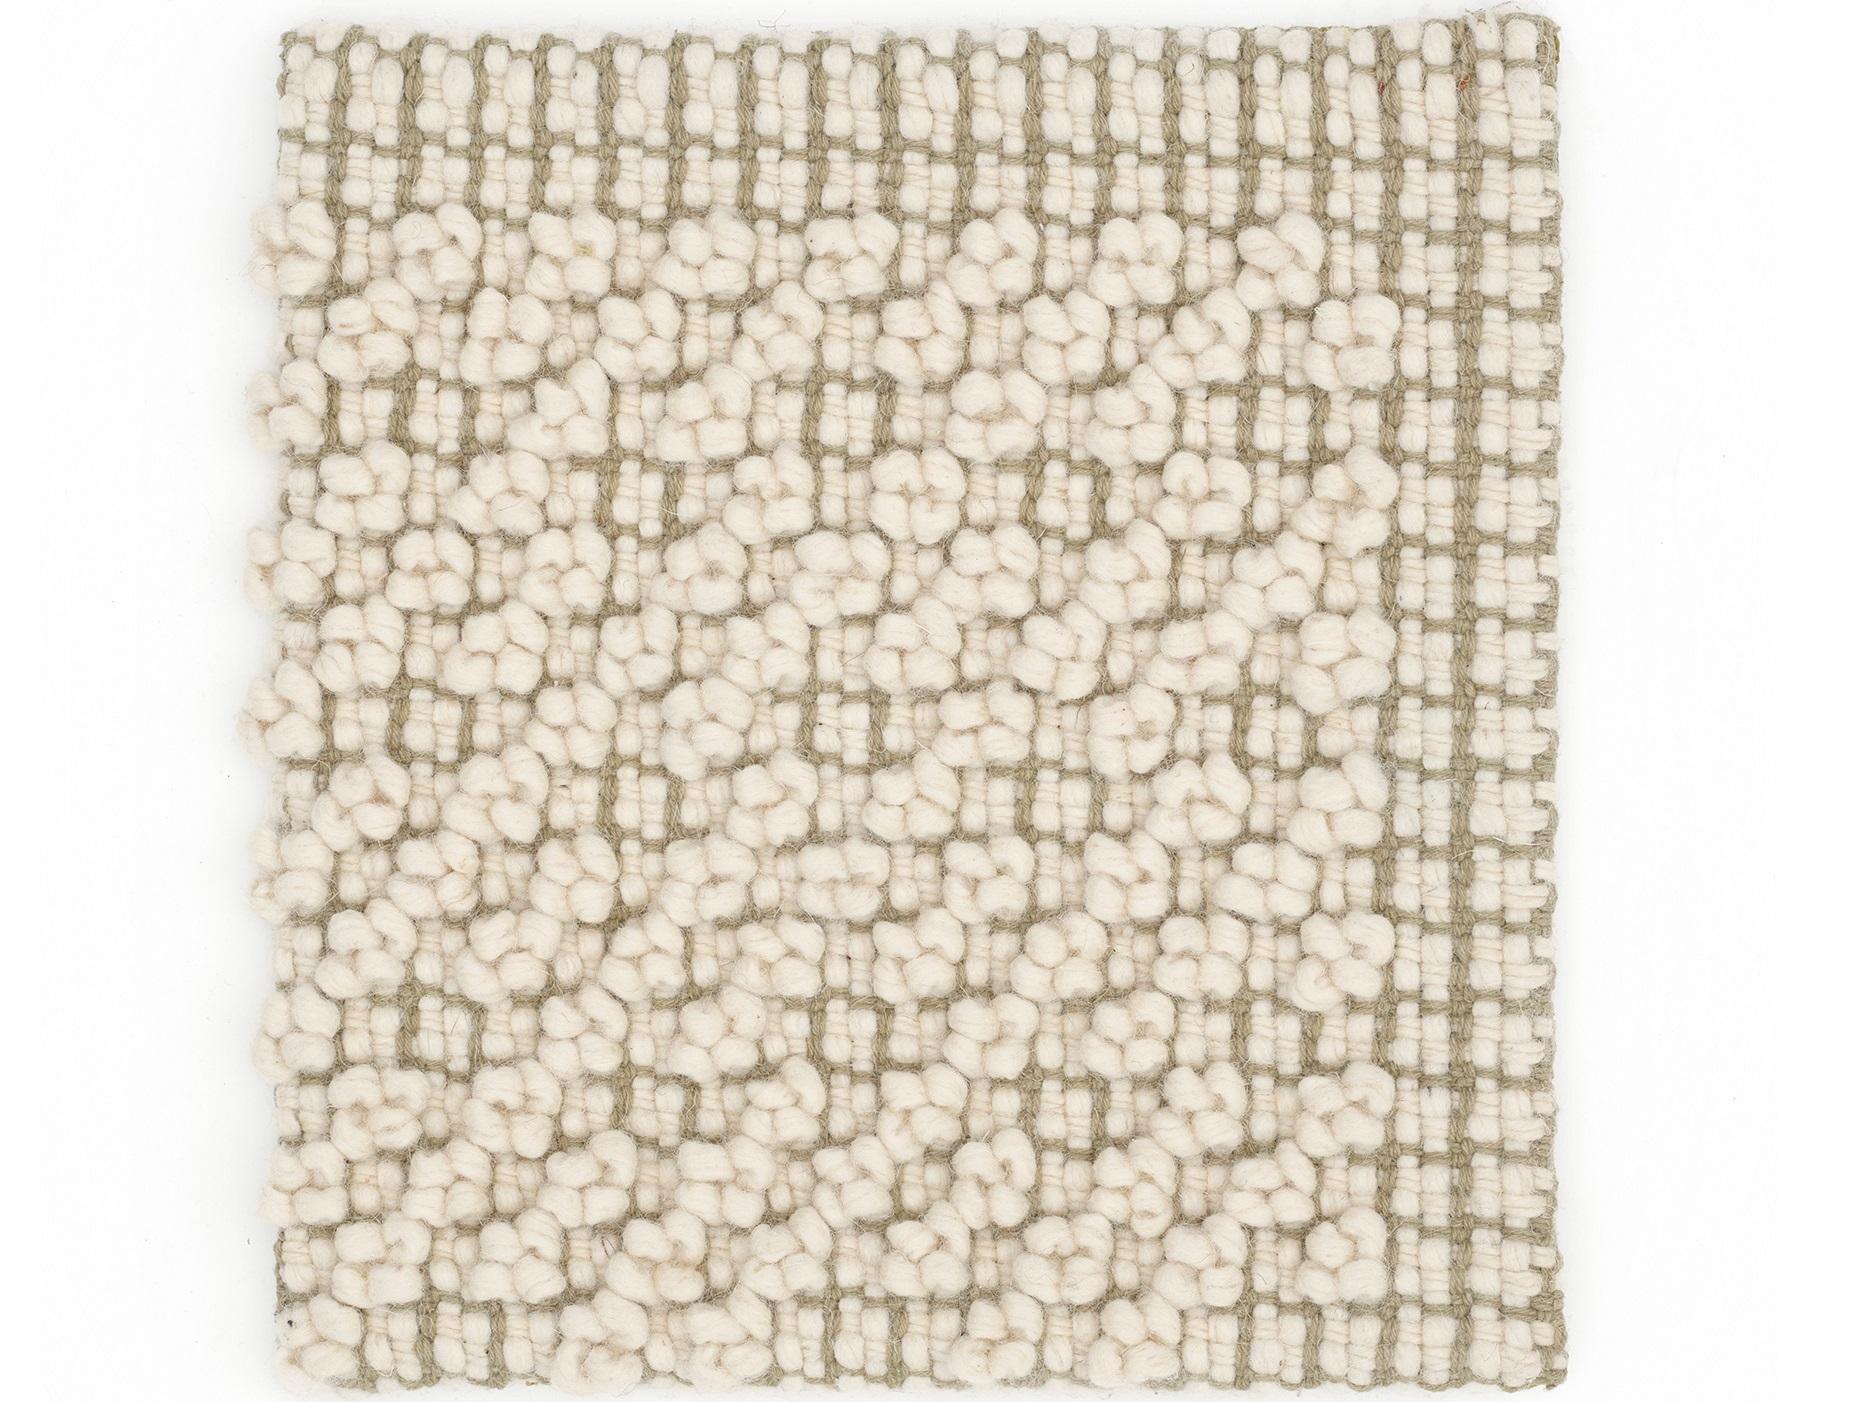 Practical Carpet Facts Danskina Cocoon